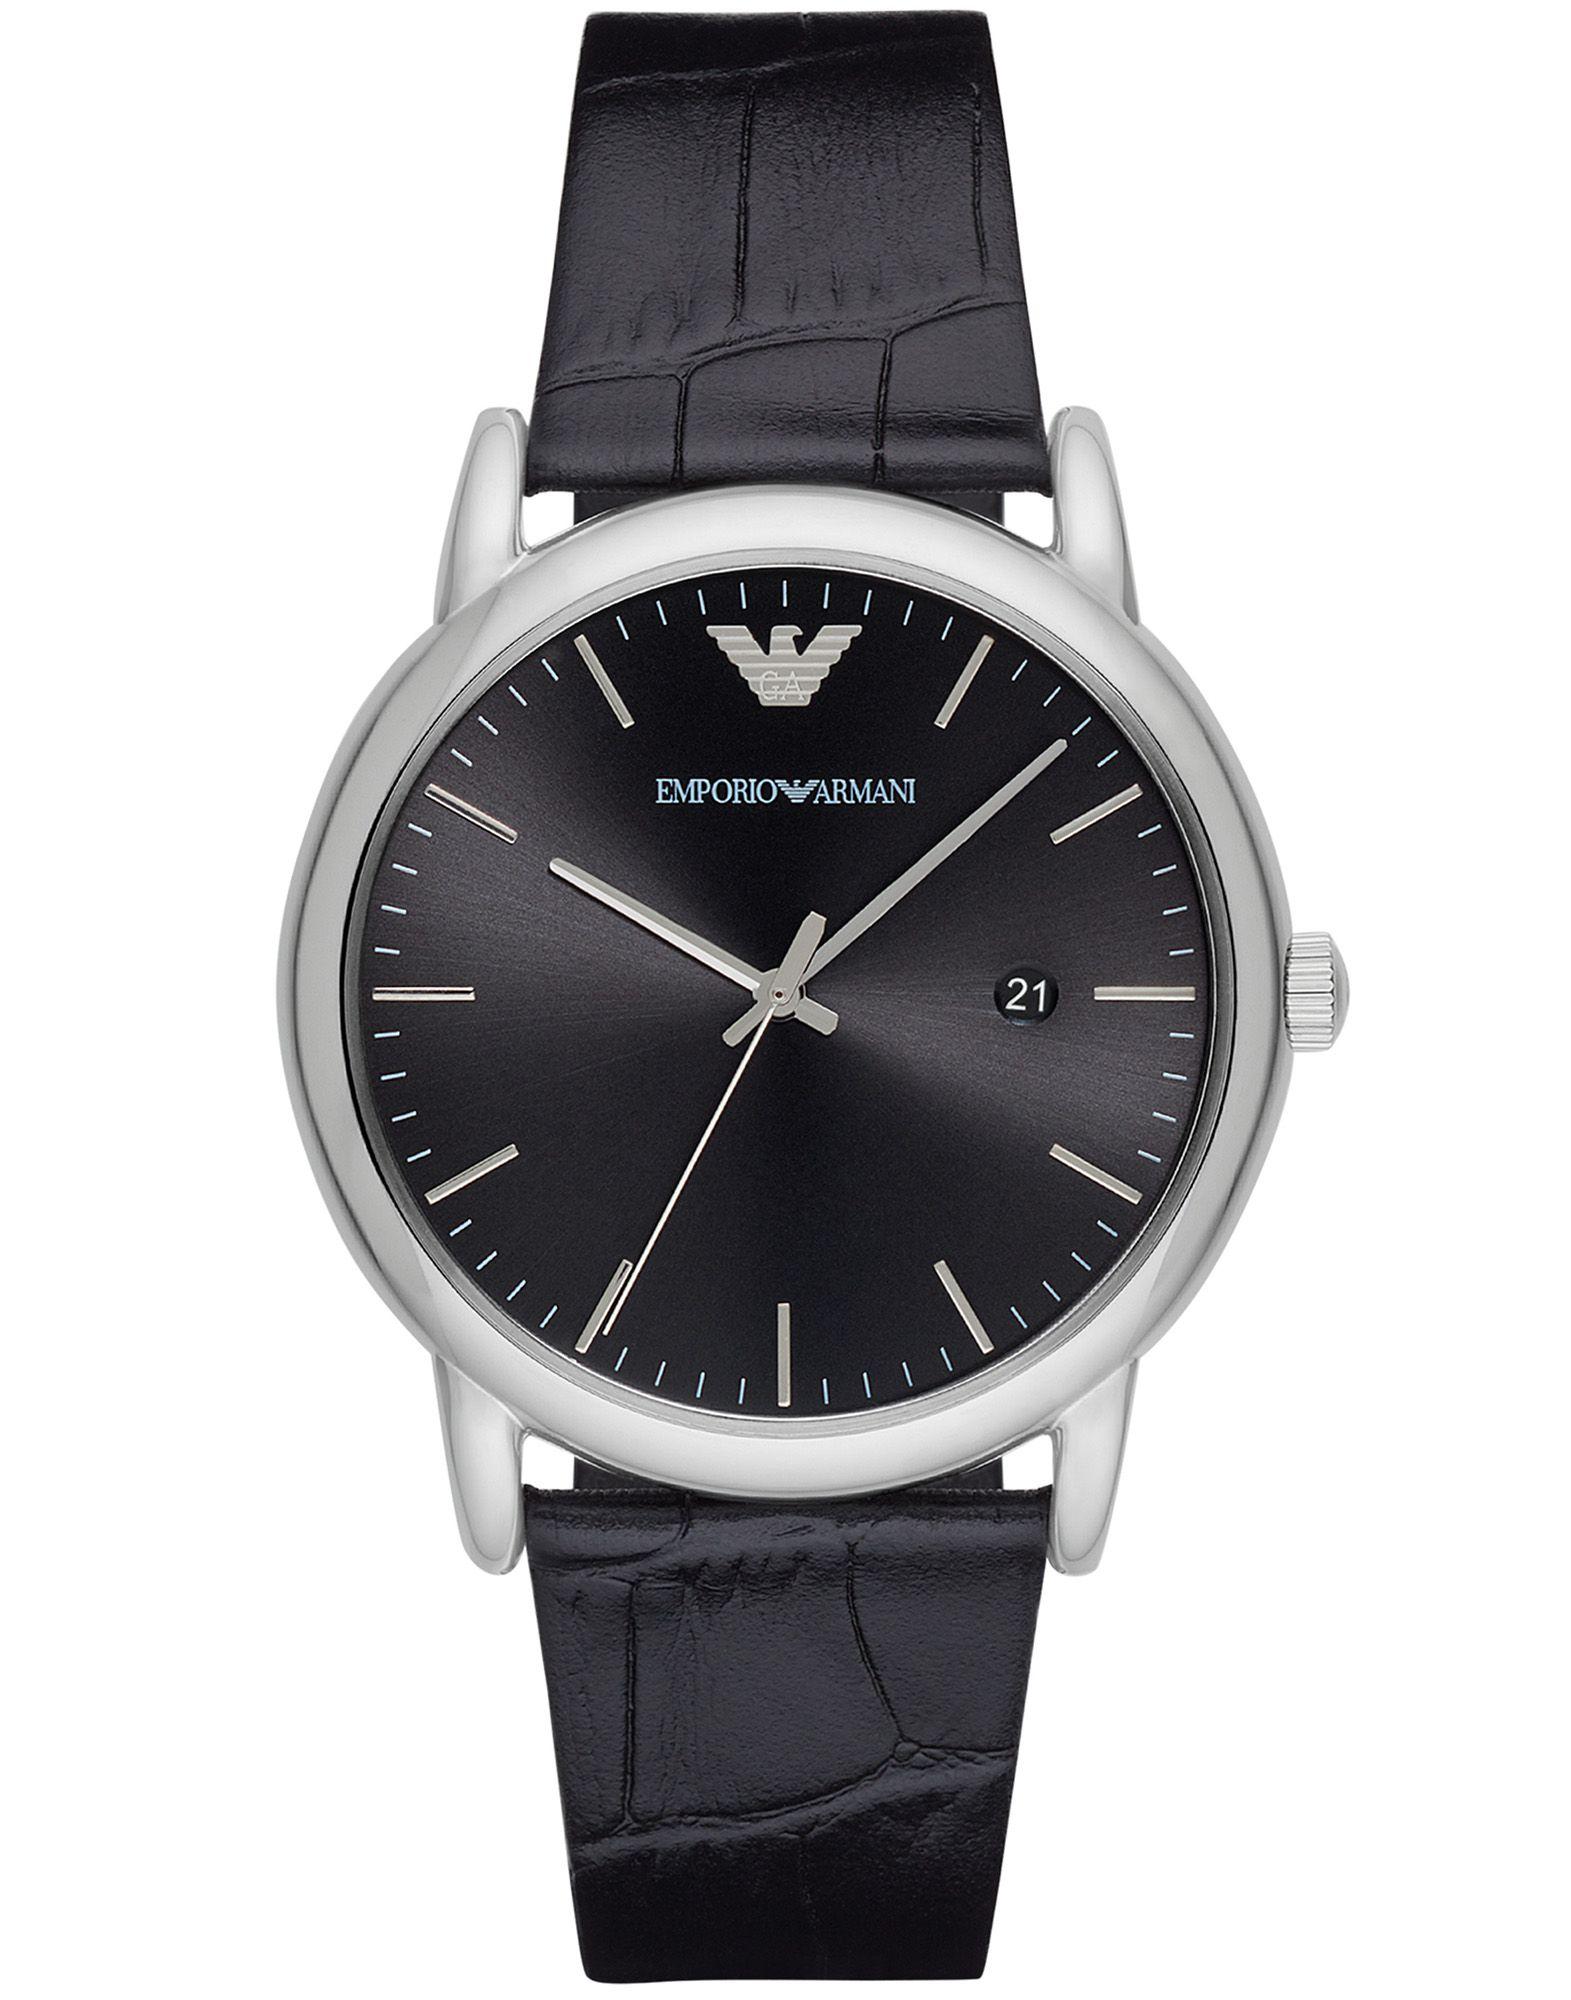 EMPORIO ARMANI Наручные часы часы relogio feminino мужчины ложная крокодил кожа blu ray часынаручные часы